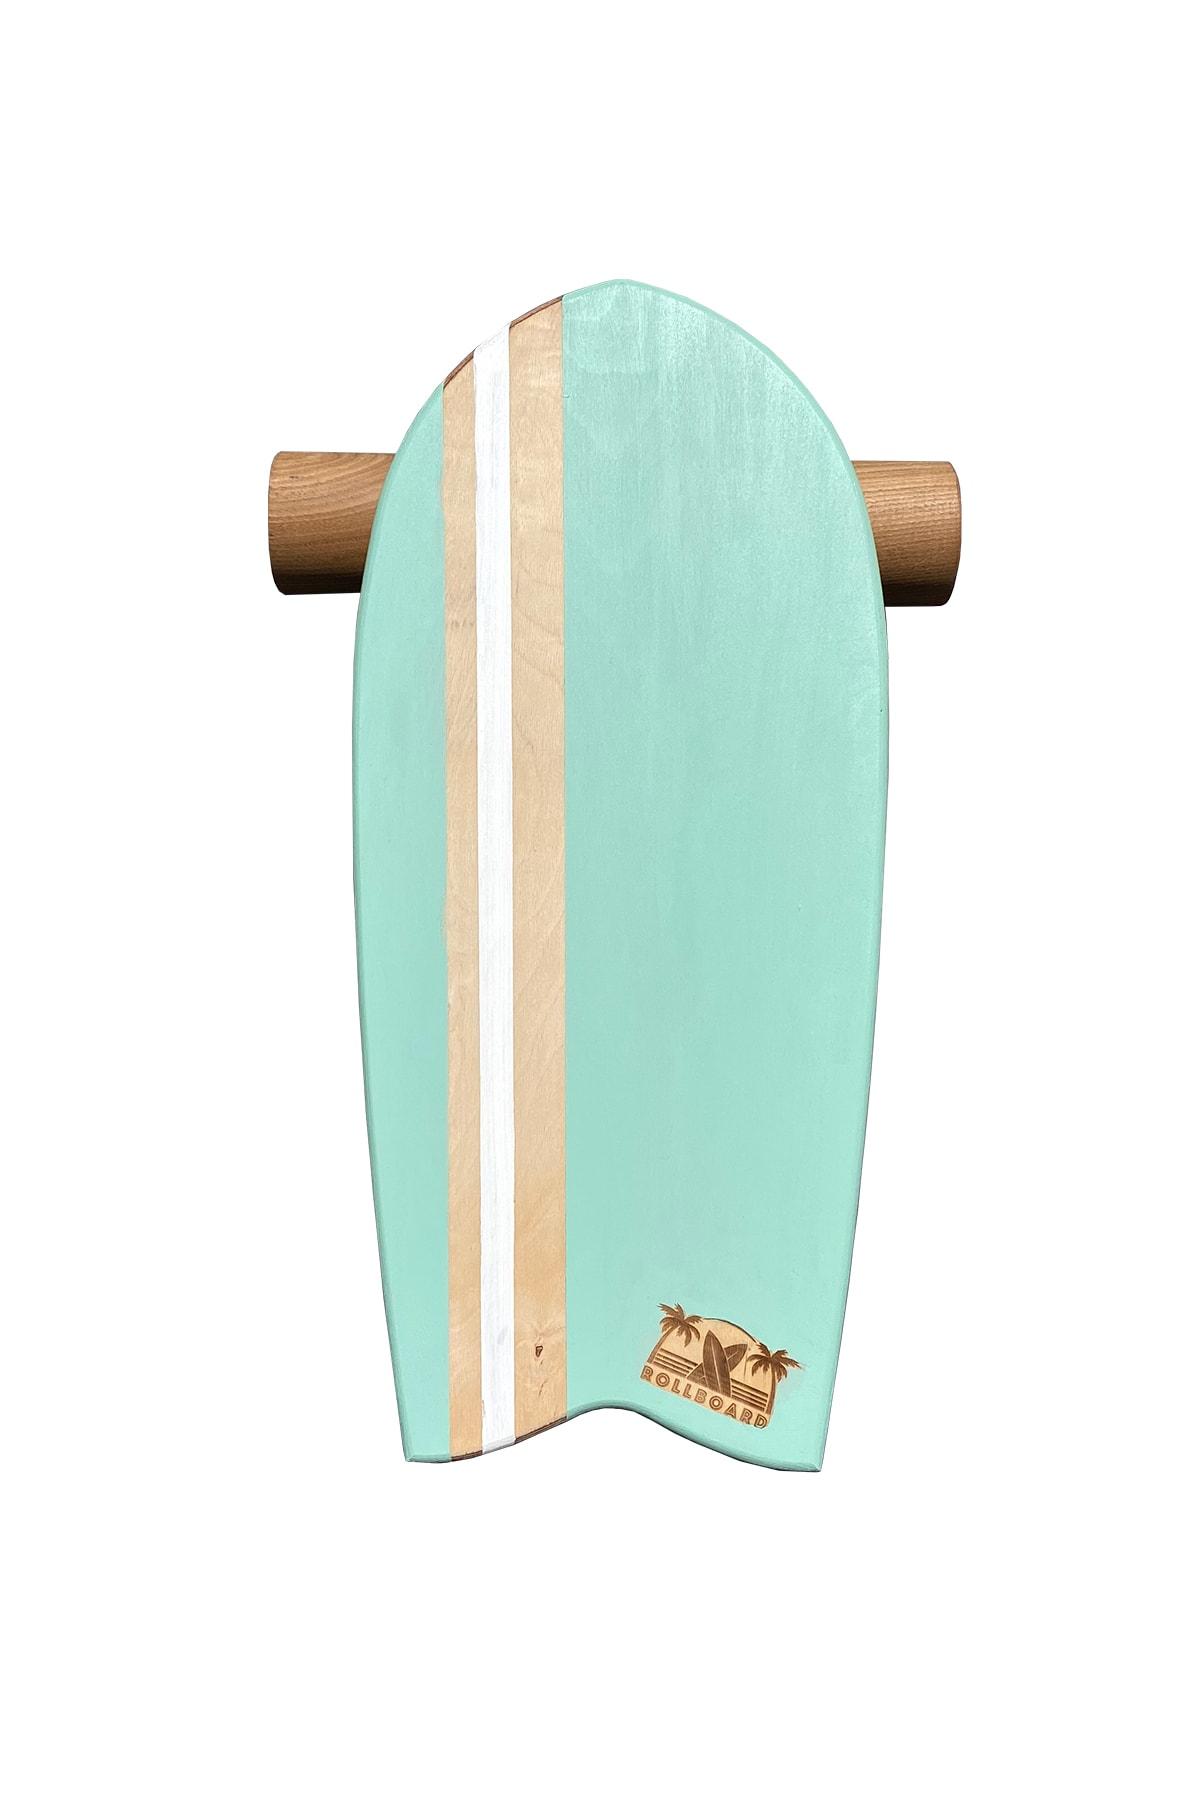 Bondi Mint El Yapımı Set Denge Tahtası - Handmade Balance Board